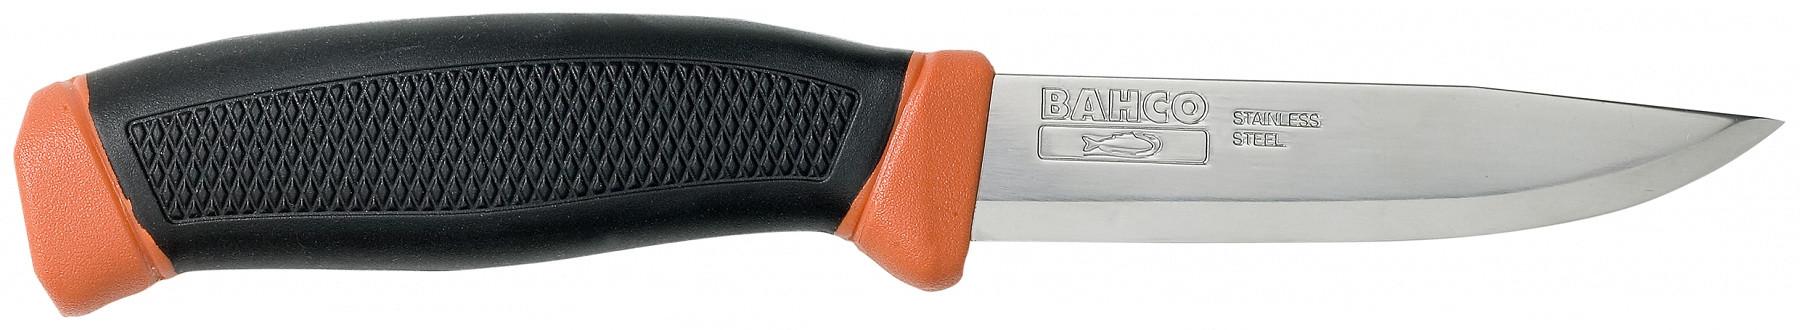 Couteau professionnel multi-usages 22cm BAHCO